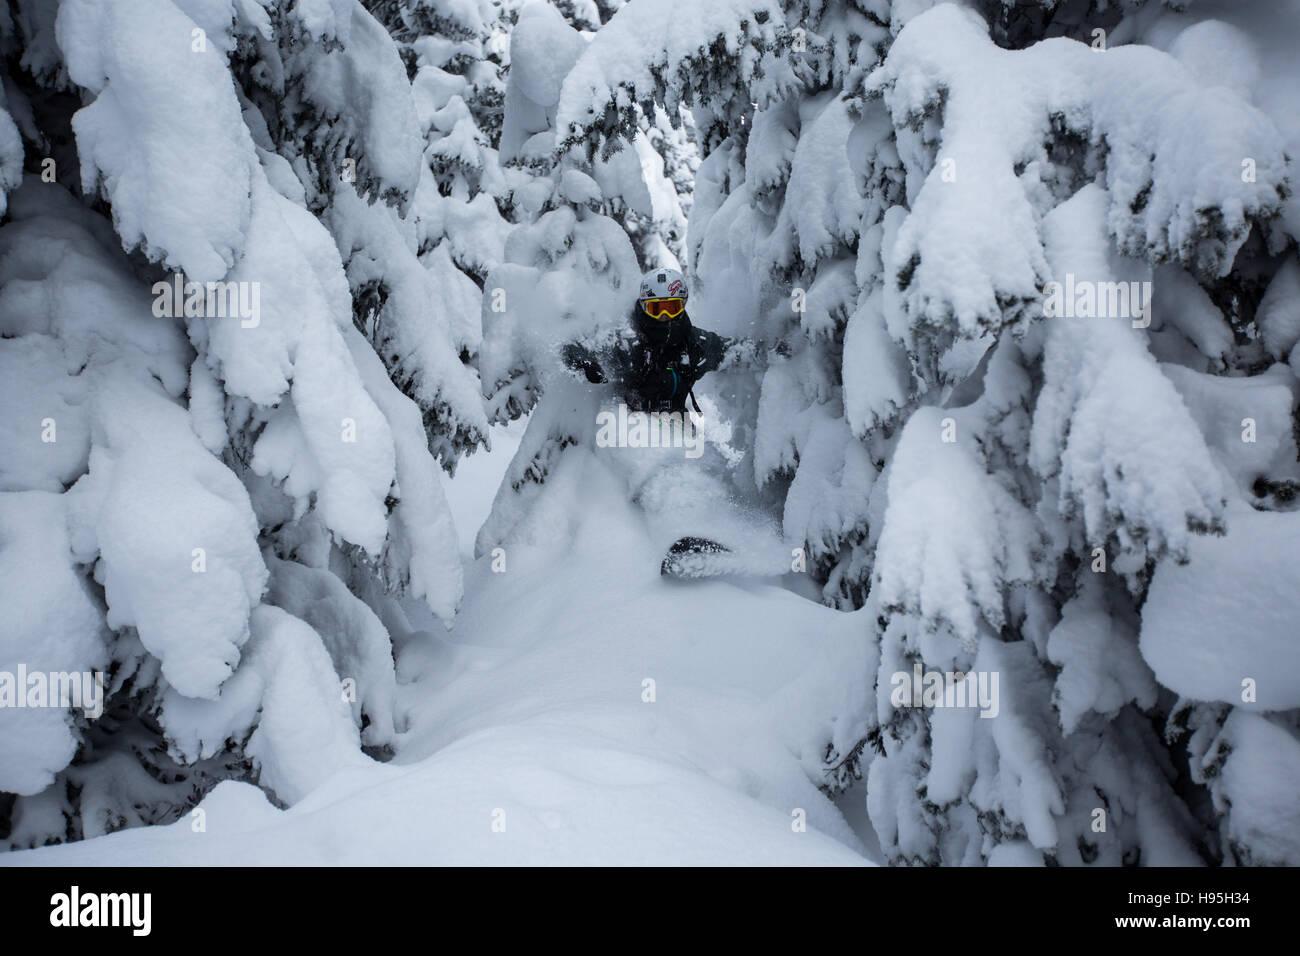 Snowboarding the powder on the ski resort of Saint Gervais Les Bains - Stock Image